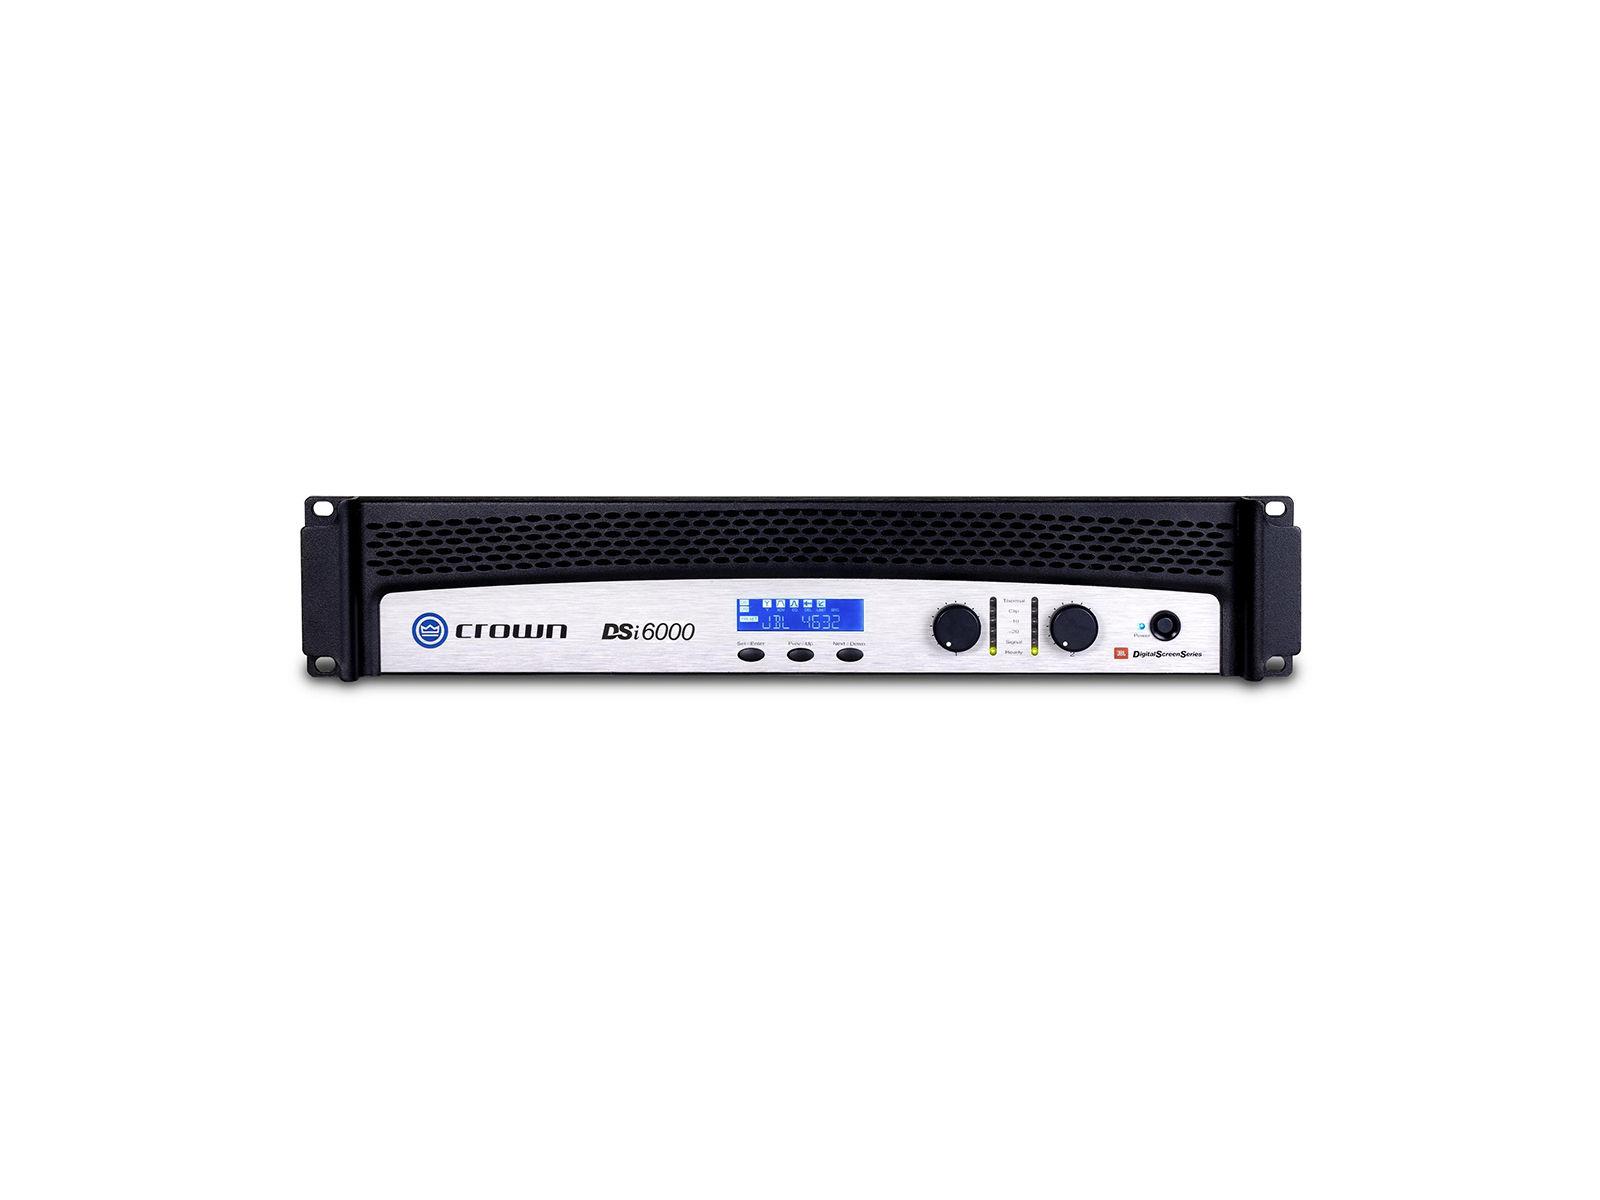 Crown DSi 6000 | Endstufe, 2x 2100W/4Ω, DSP, LCD, HiQnet, Phoenix, D-Sub, Cinema (THX approved)